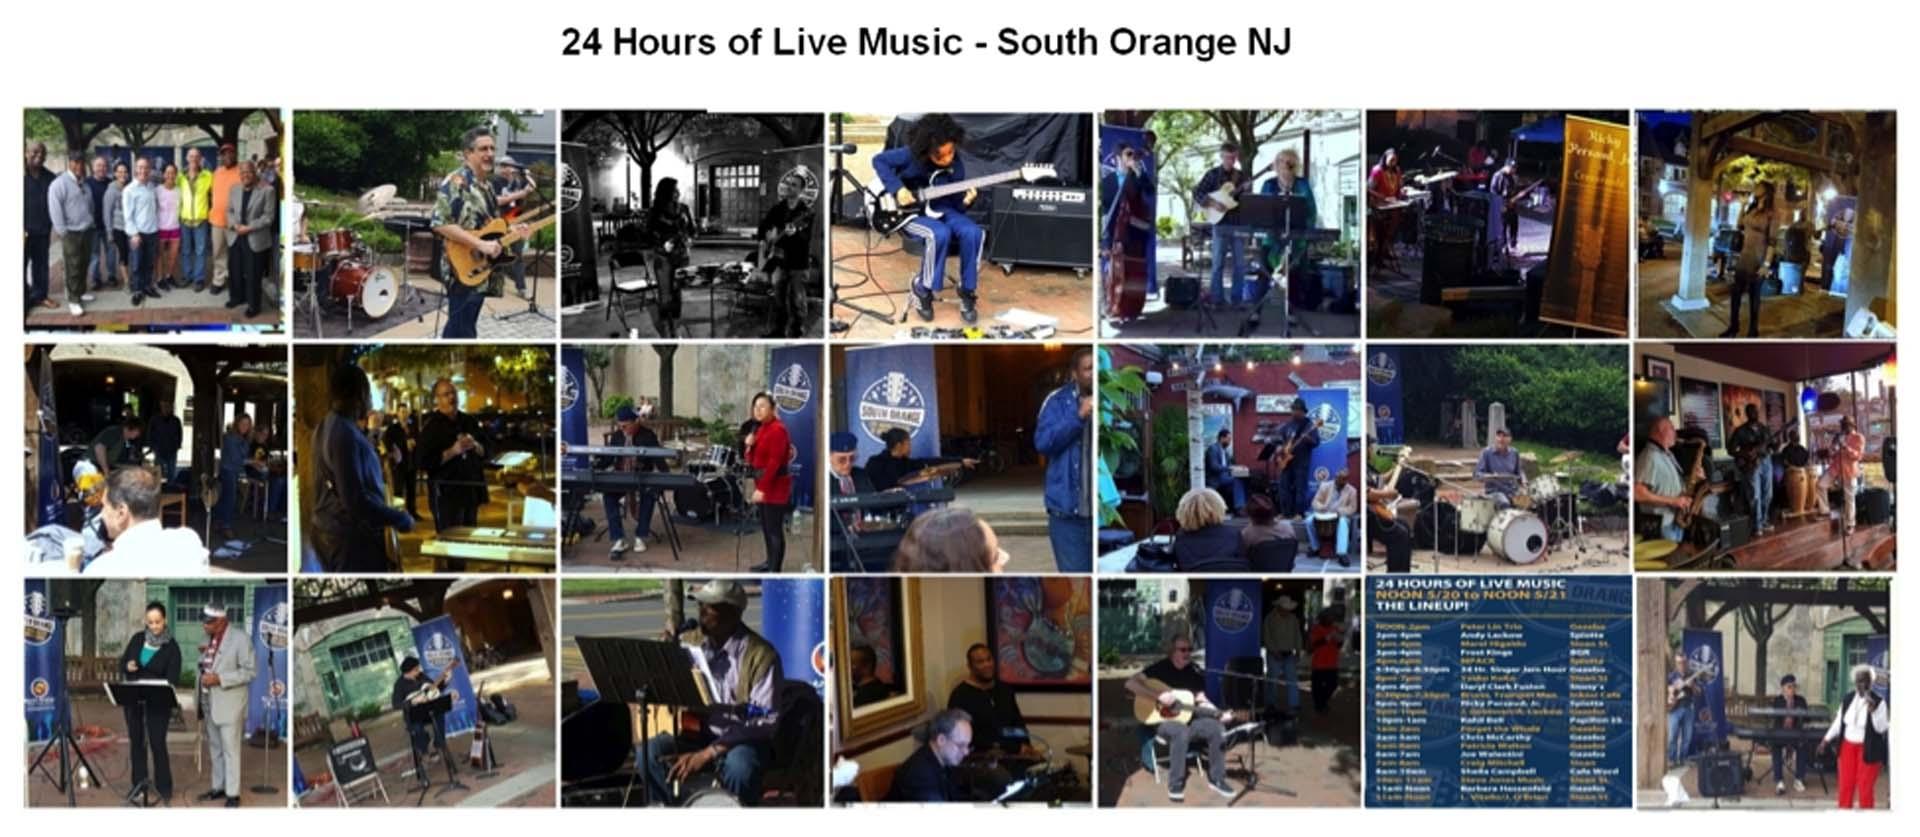 24 Hours of Live Music South Orange NJ.jpg